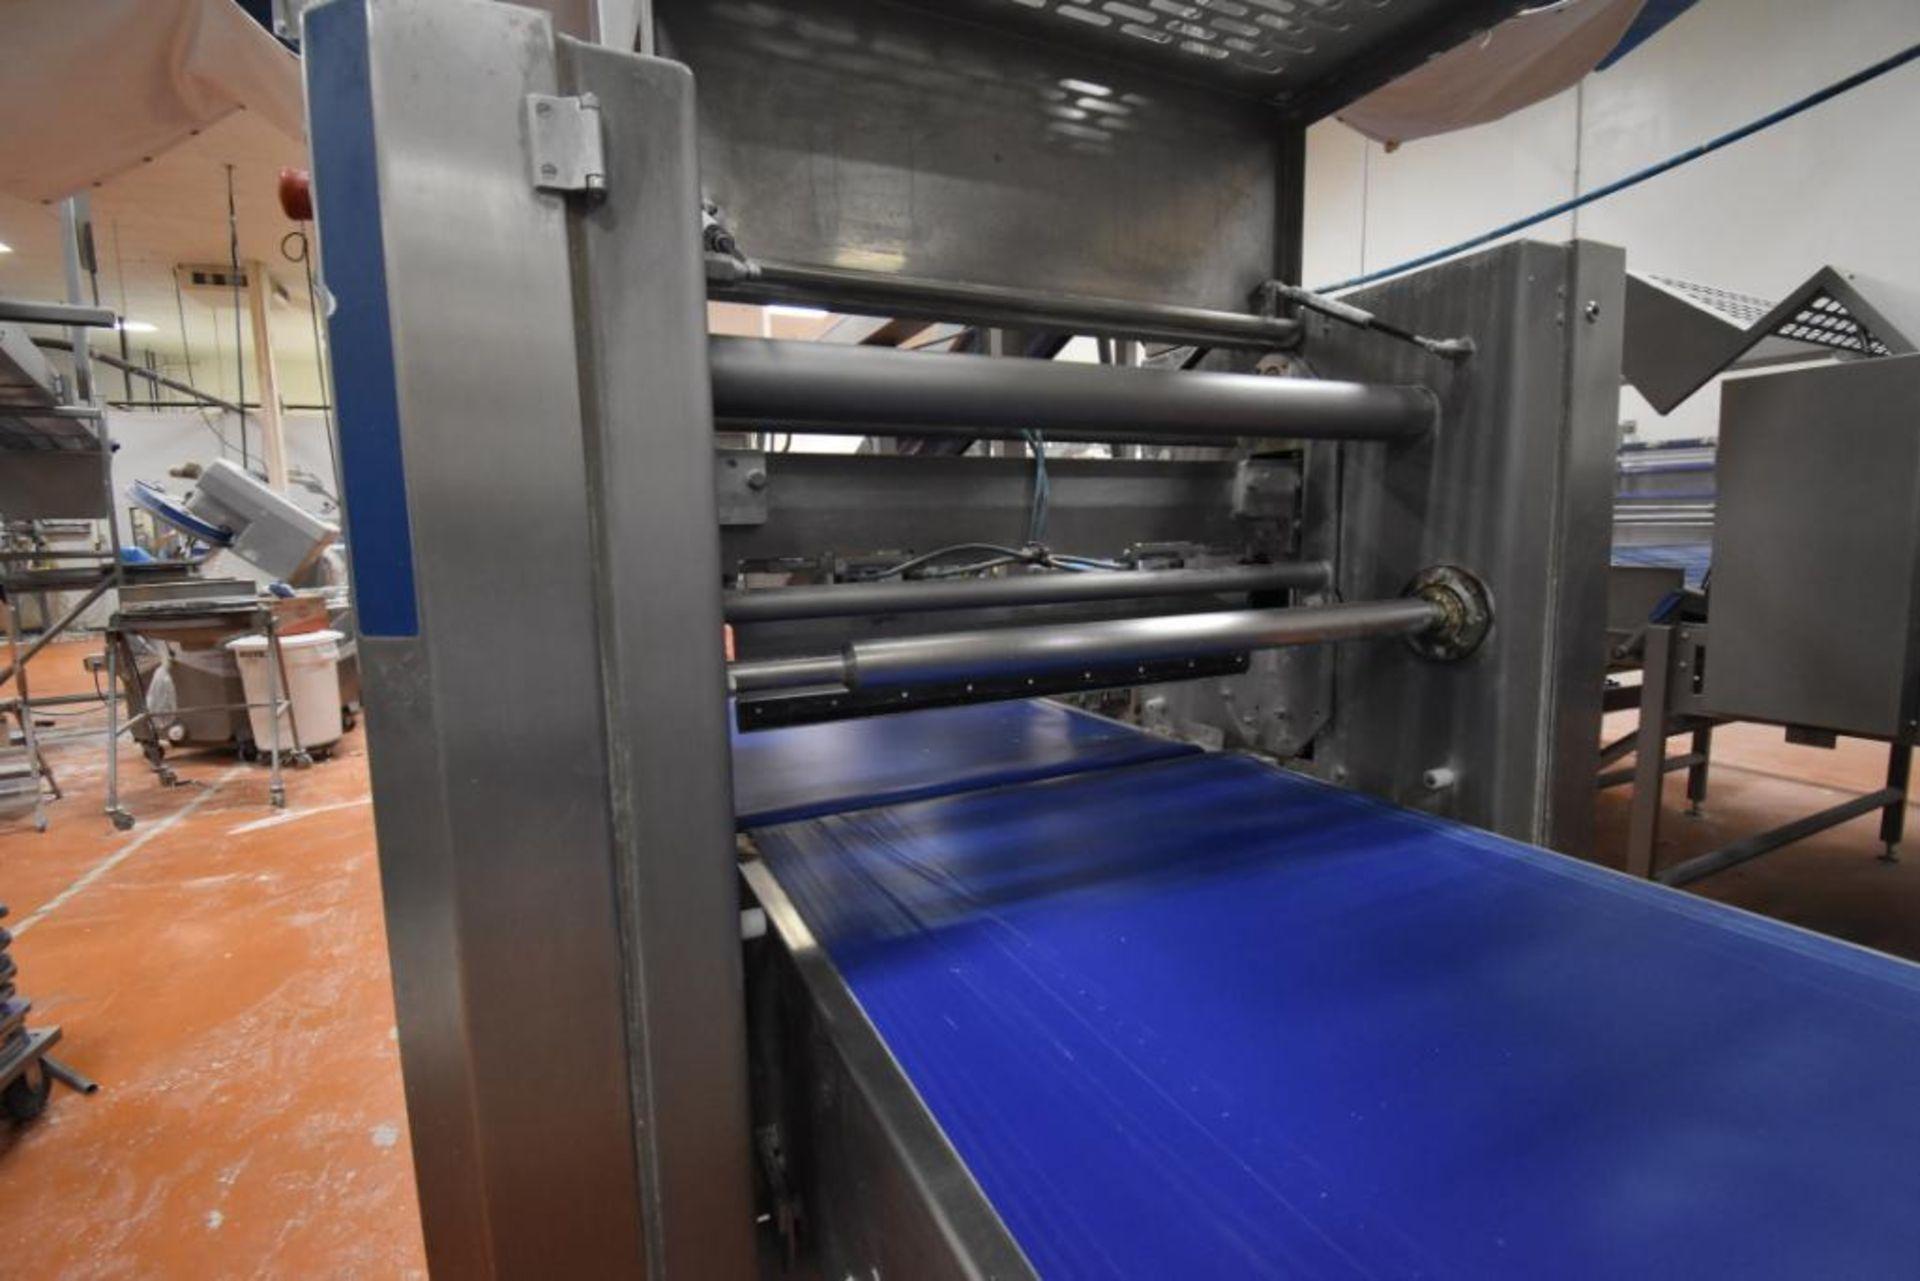 2007 Fritsch Laminator 3000 dough line - Image 169 of 280